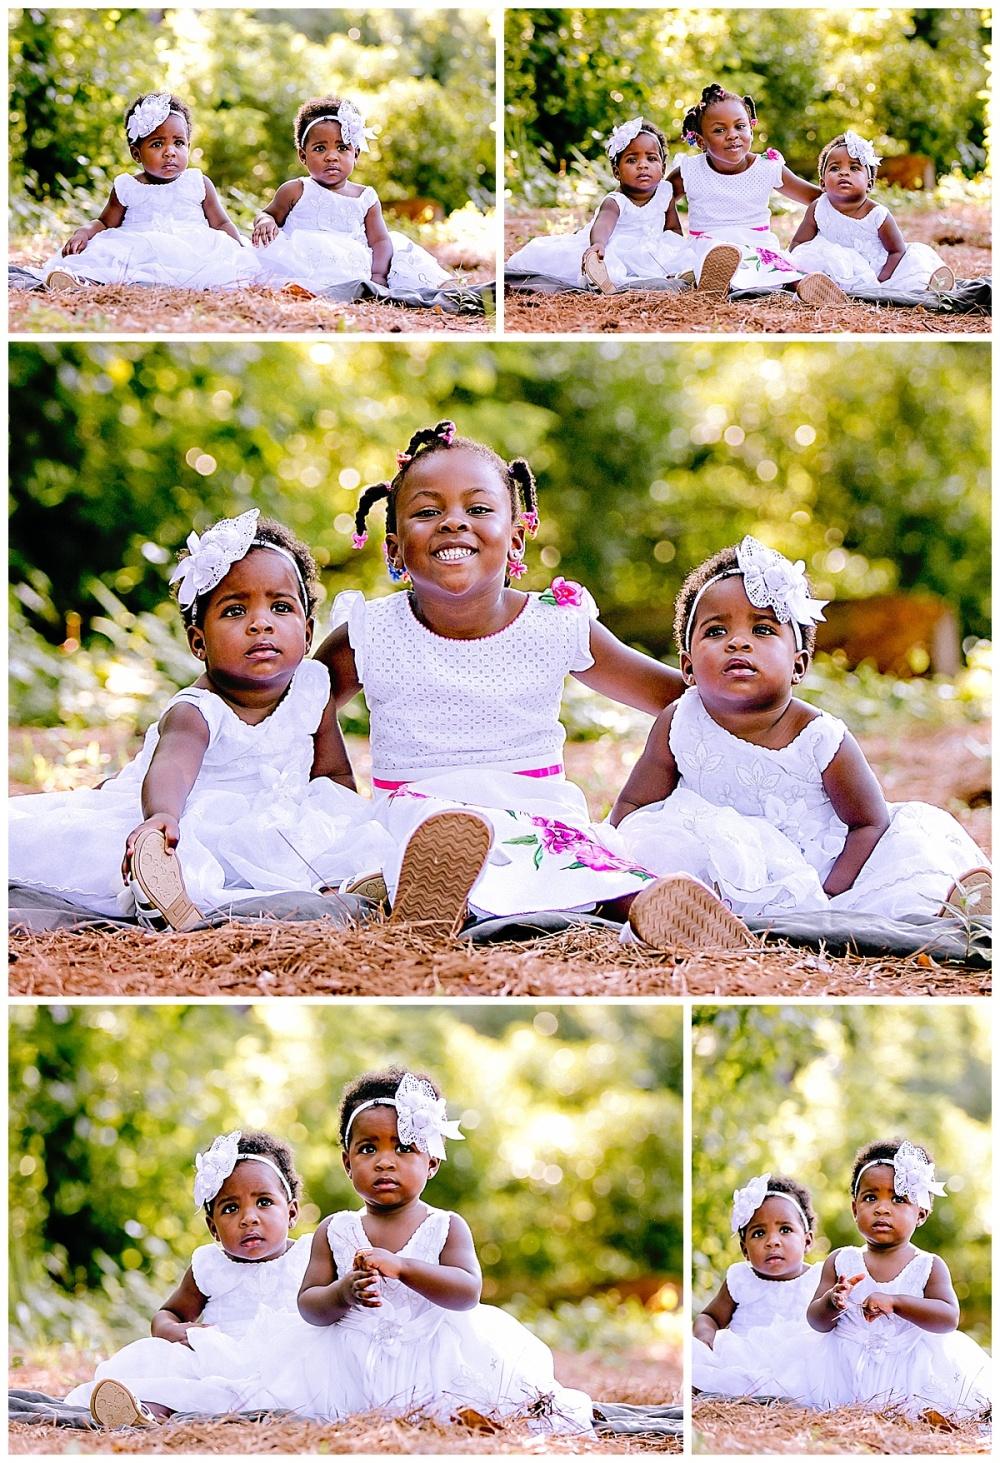 Carly-Barton-Photography-Family-Session-Kilgore-Texas-Twins-1-year-birthday-cake-smash-Olowo-family-photos_0029.jpg